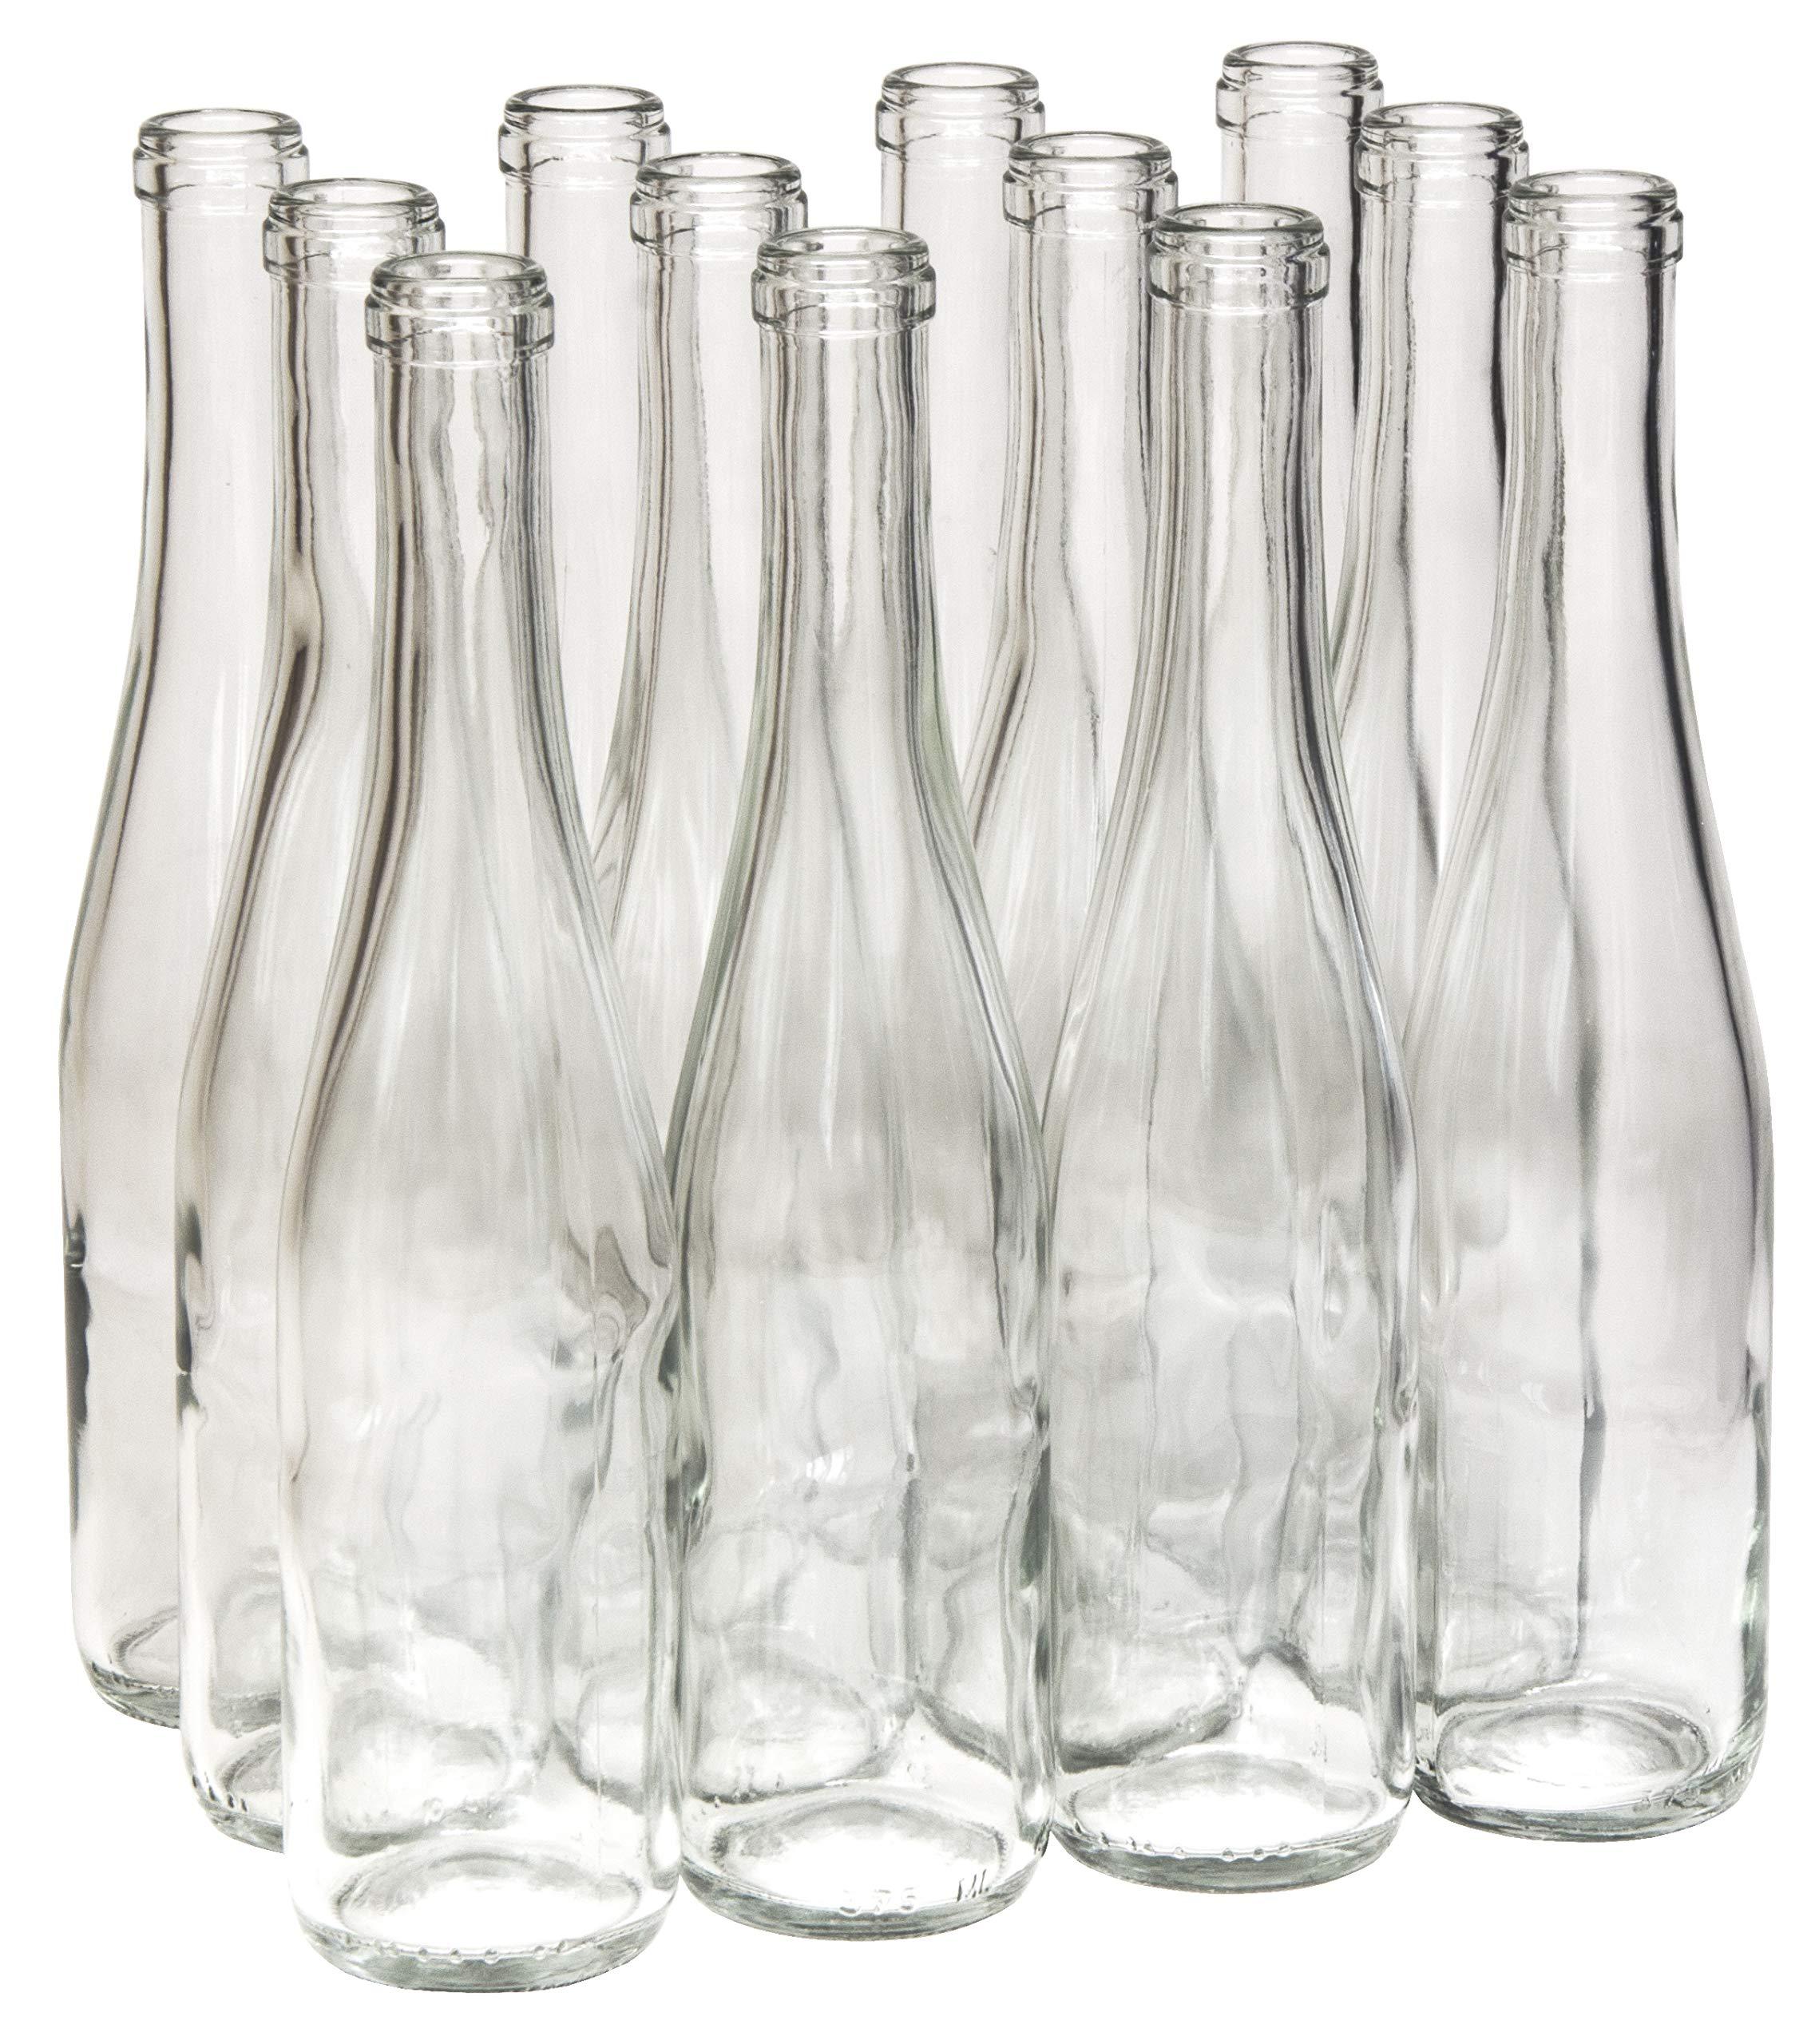 North Mountain Supply 375ml Clear/Flint Glass Stretch Hock Wine Bottle Flat-Bottomed Cork Finish - Case of 12 by North Mountain Supply